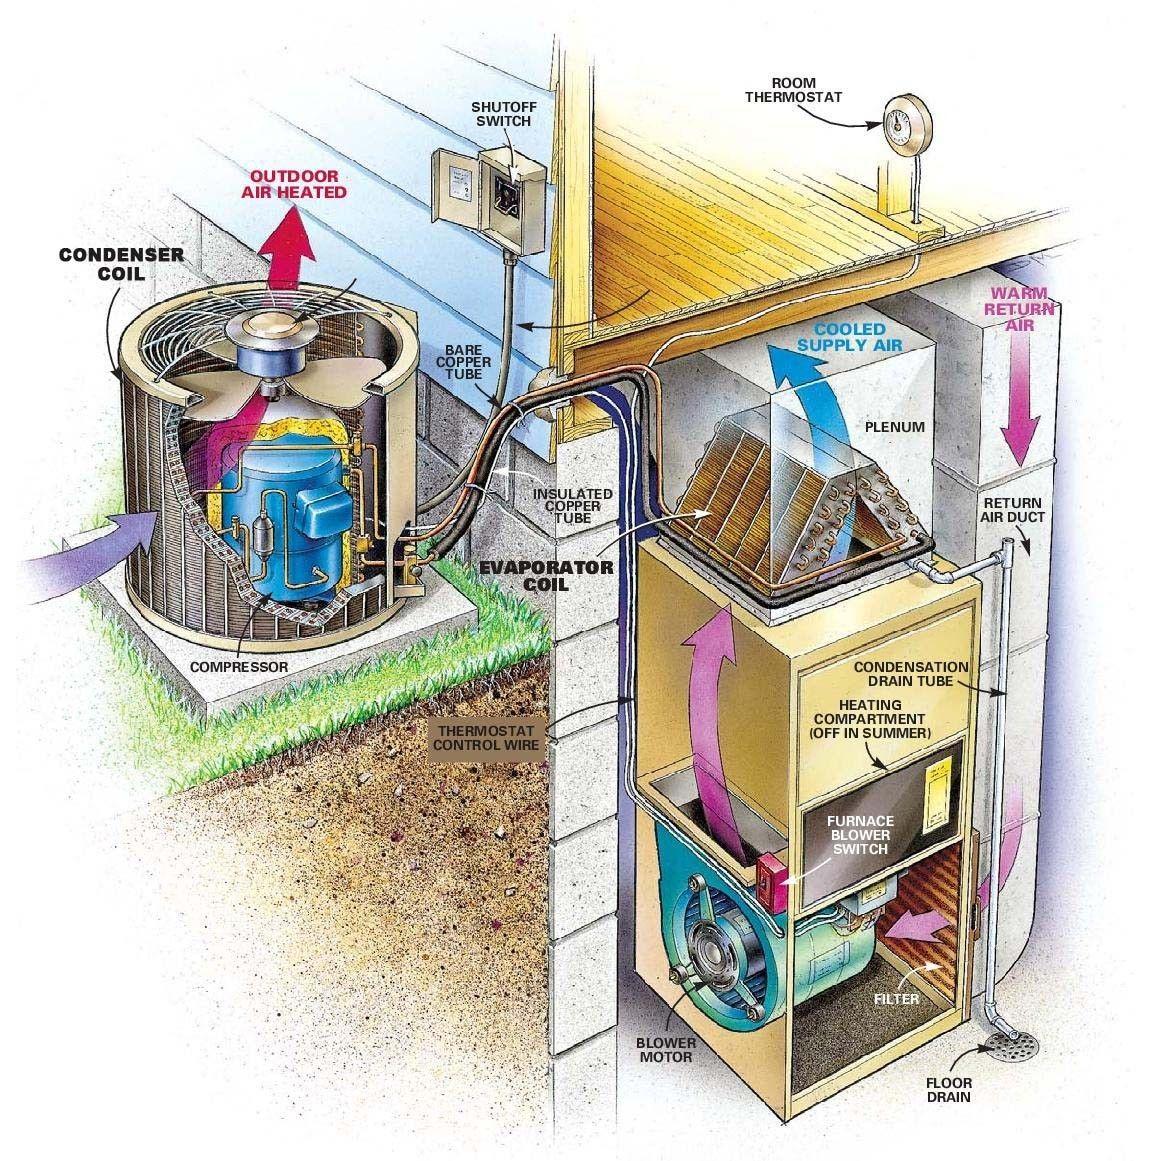 Ac Unit Diagram - All Wiring Diagram Data - Ac Unit Wiring Diagram